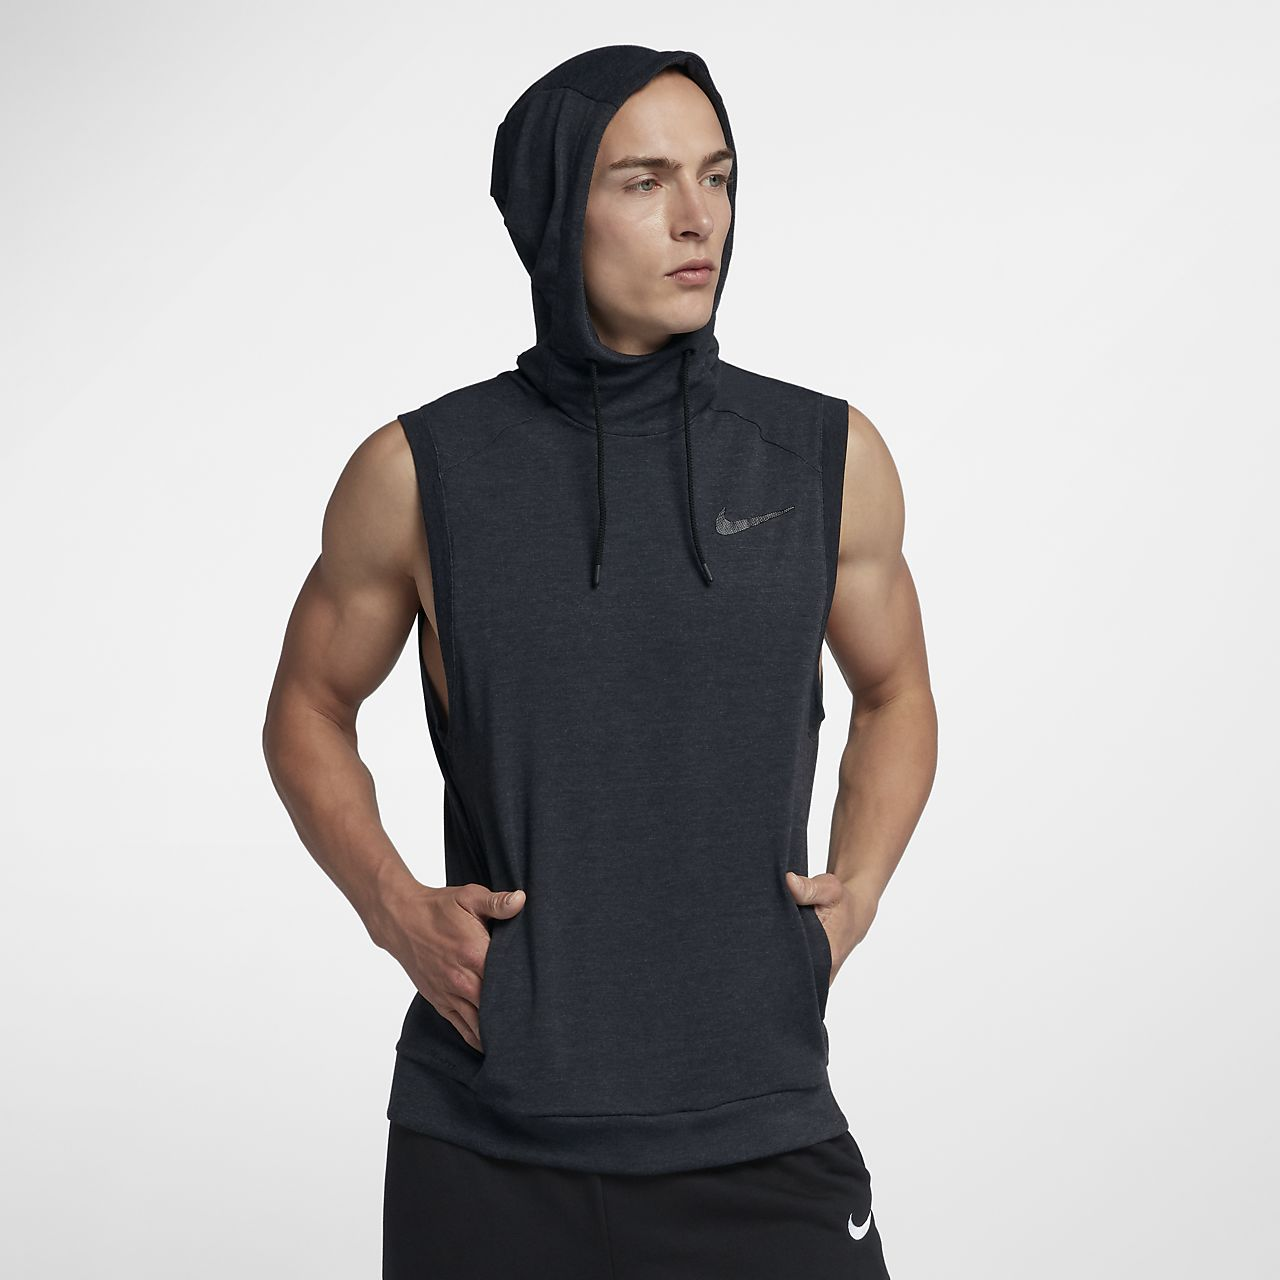 Nike Dri-FIT Men Sleeveless Training Hoodie